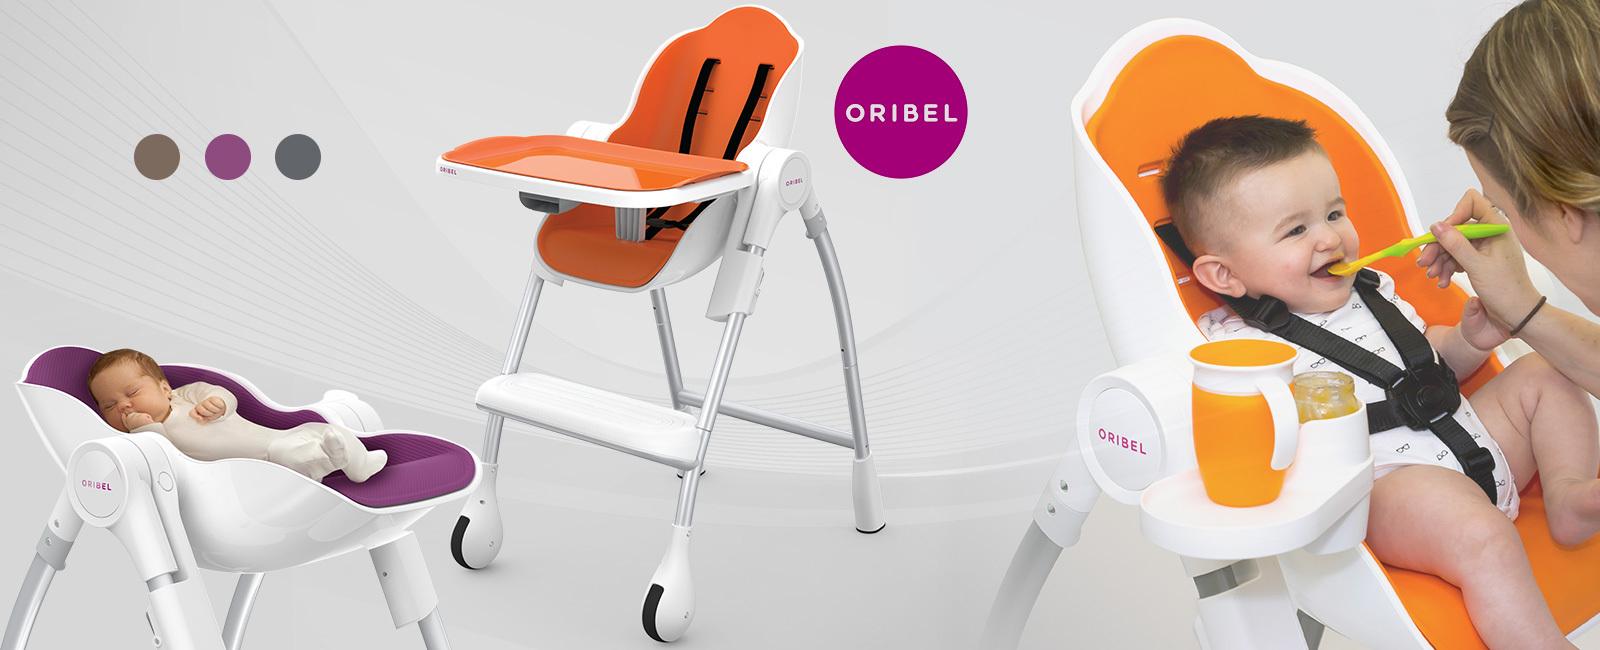 Oribel Cocoon Chaise Haute Évolutive Qids pSMUVz